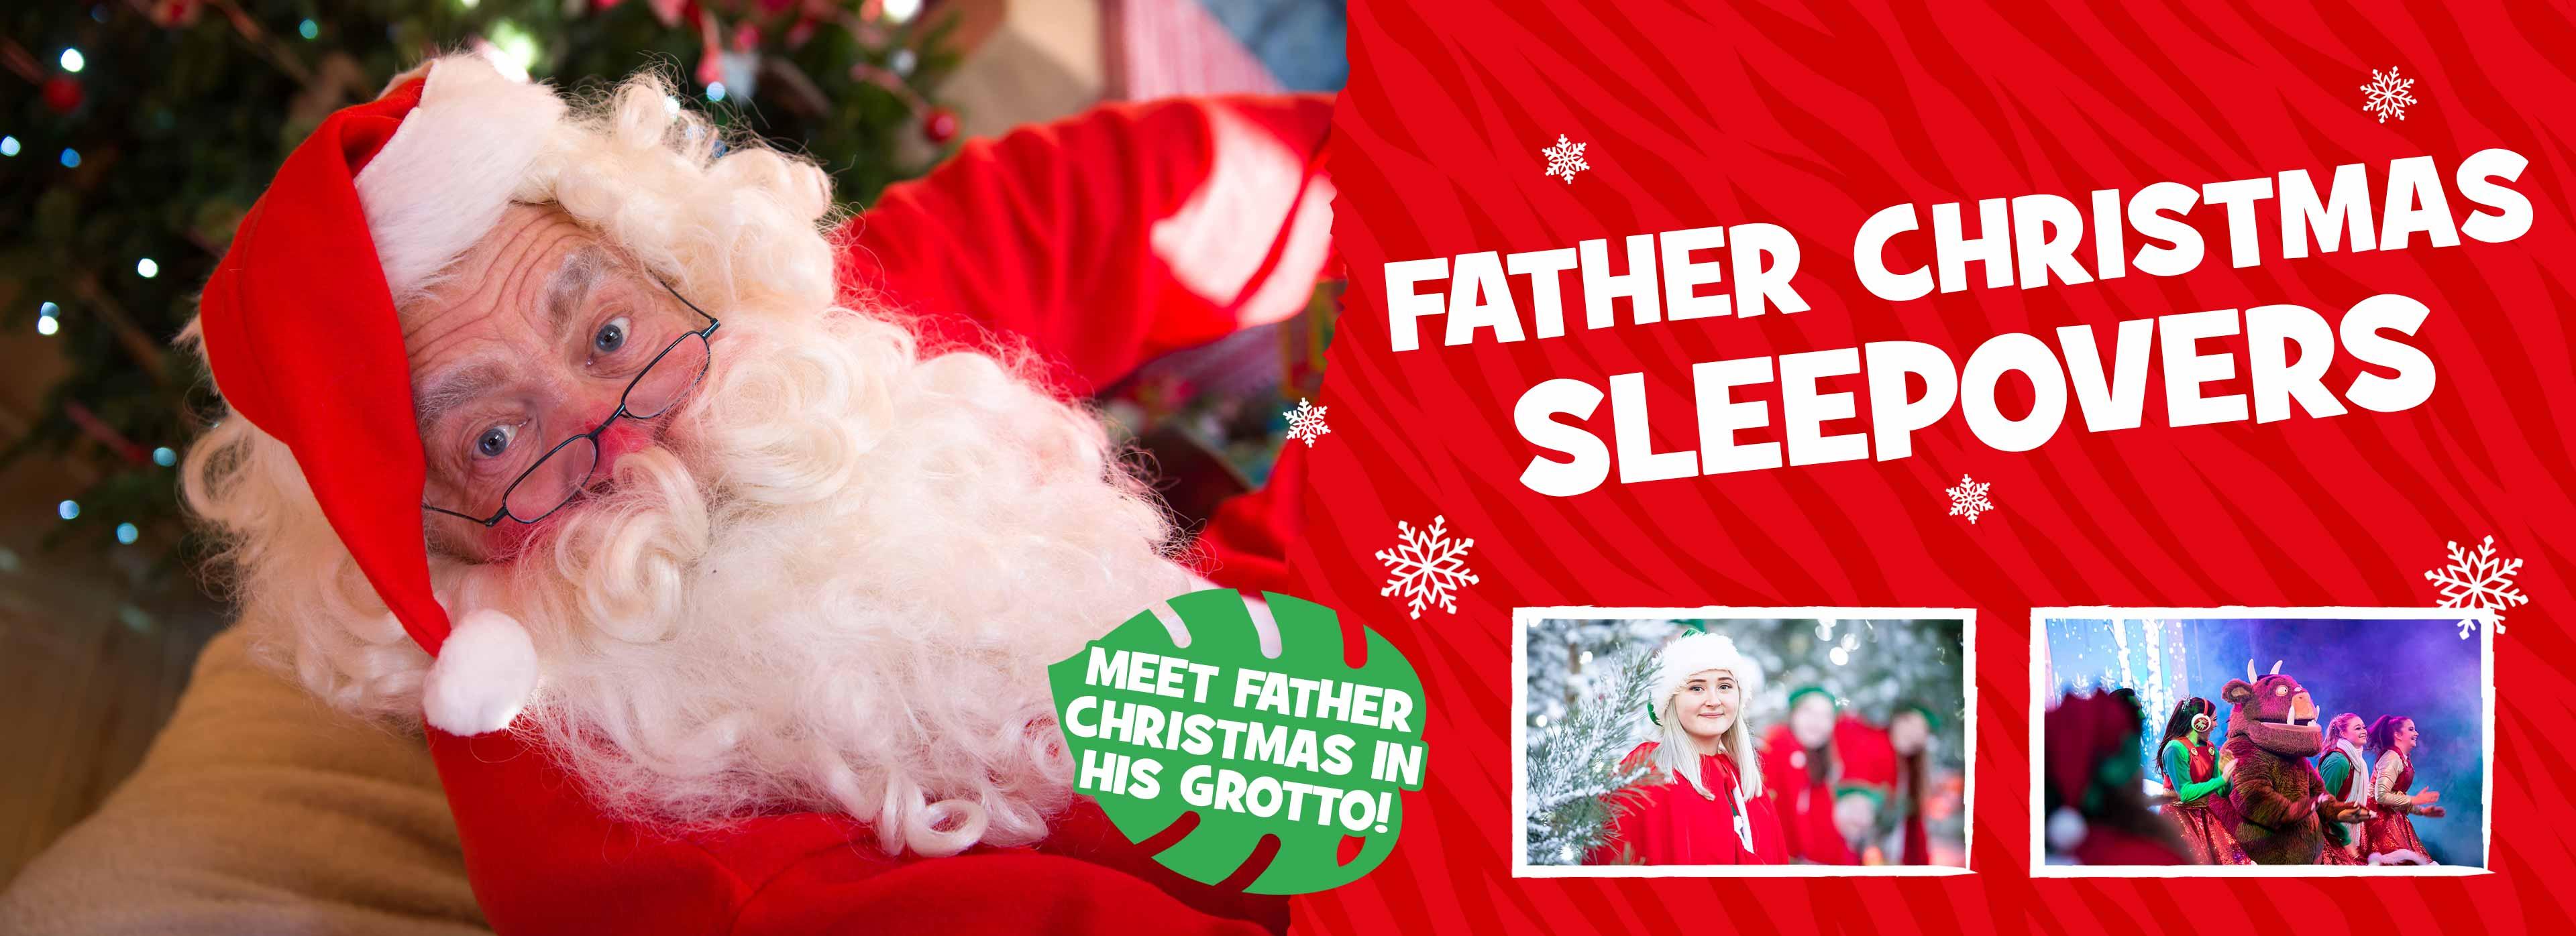 Father Chrismtas Sleepovers at Chessington World of Adventures Resort